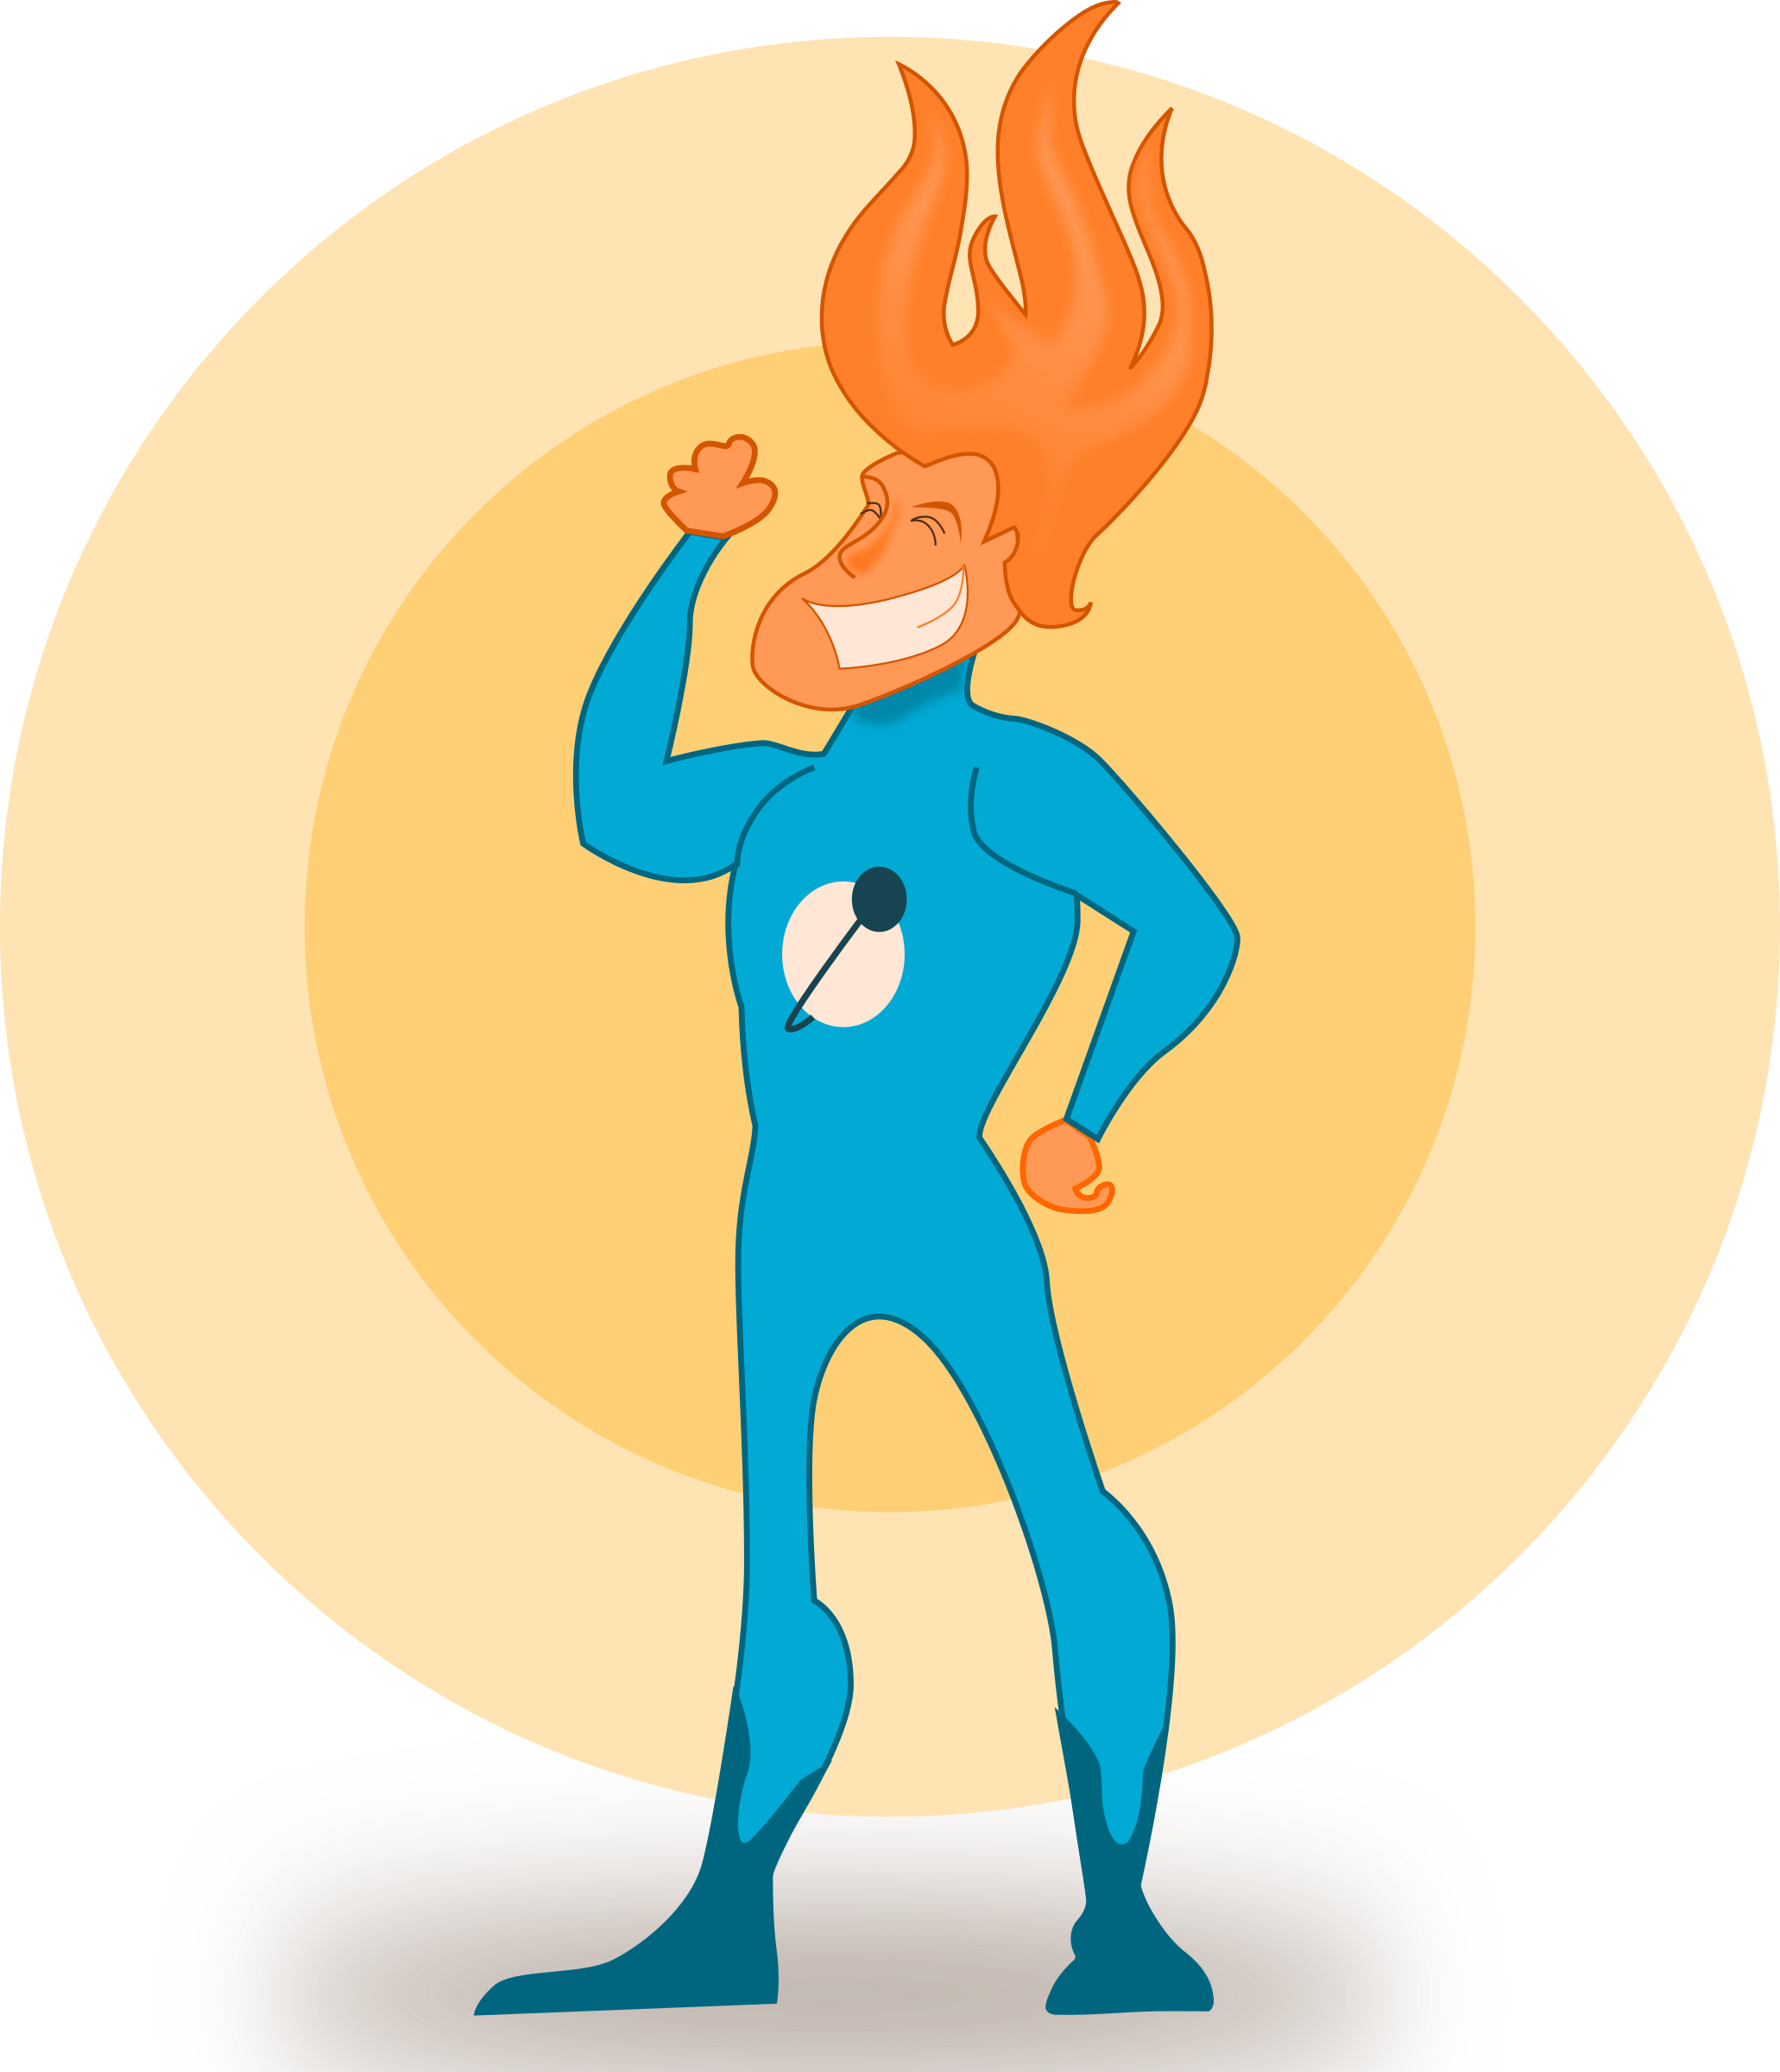 Super hero flame big. Superheroes clipart fight